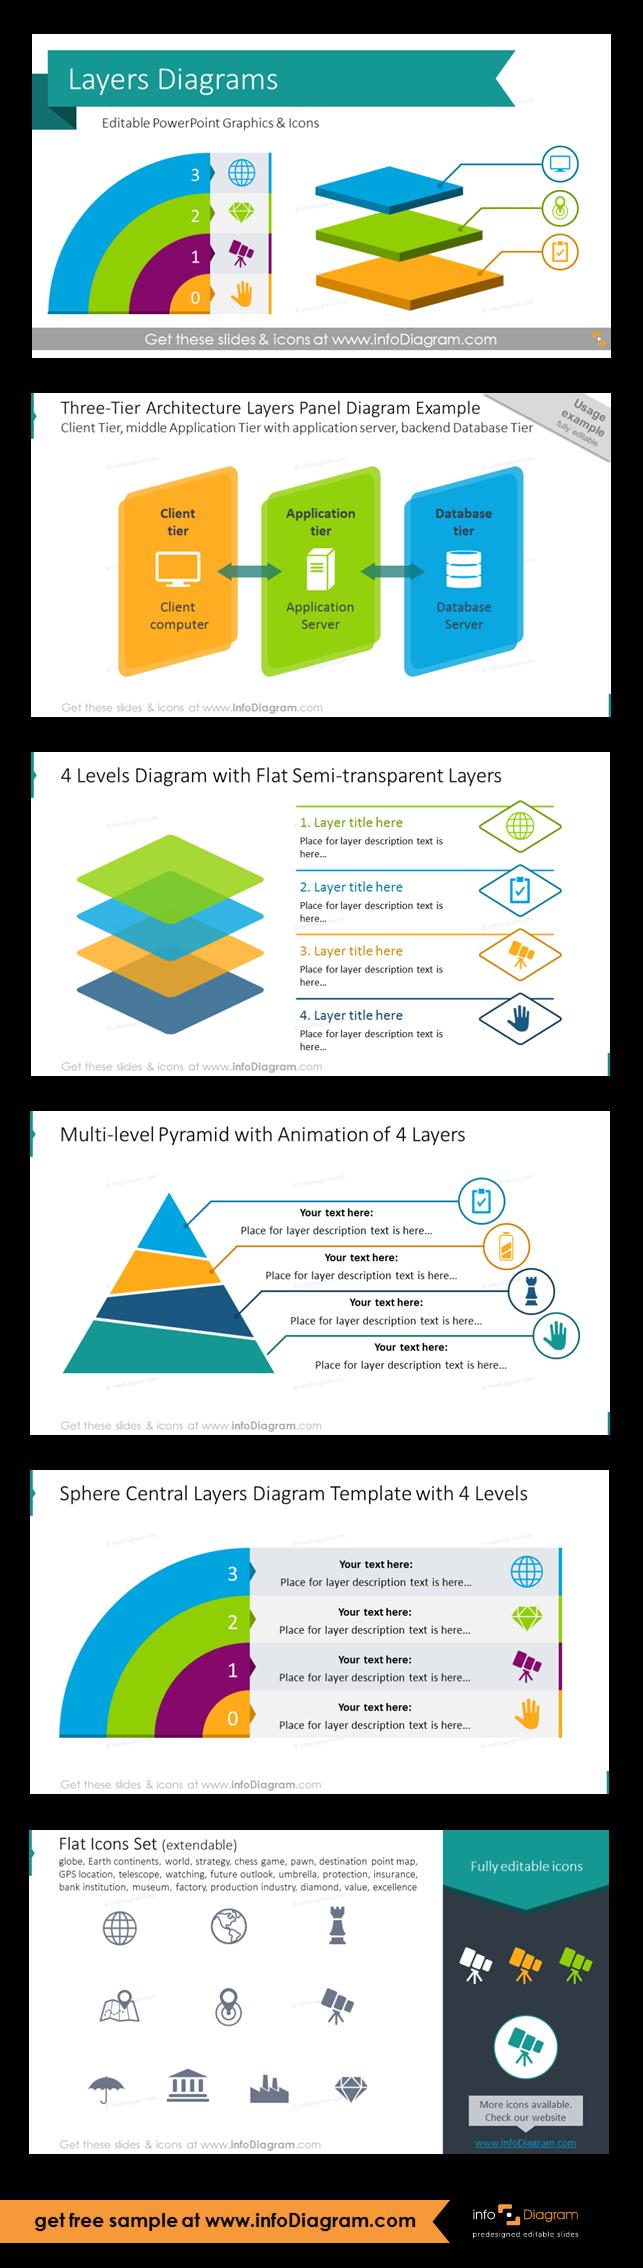 Layers Tiers Diagram Graphics Presentation Design Design Portfolio Site Powerpoint Design